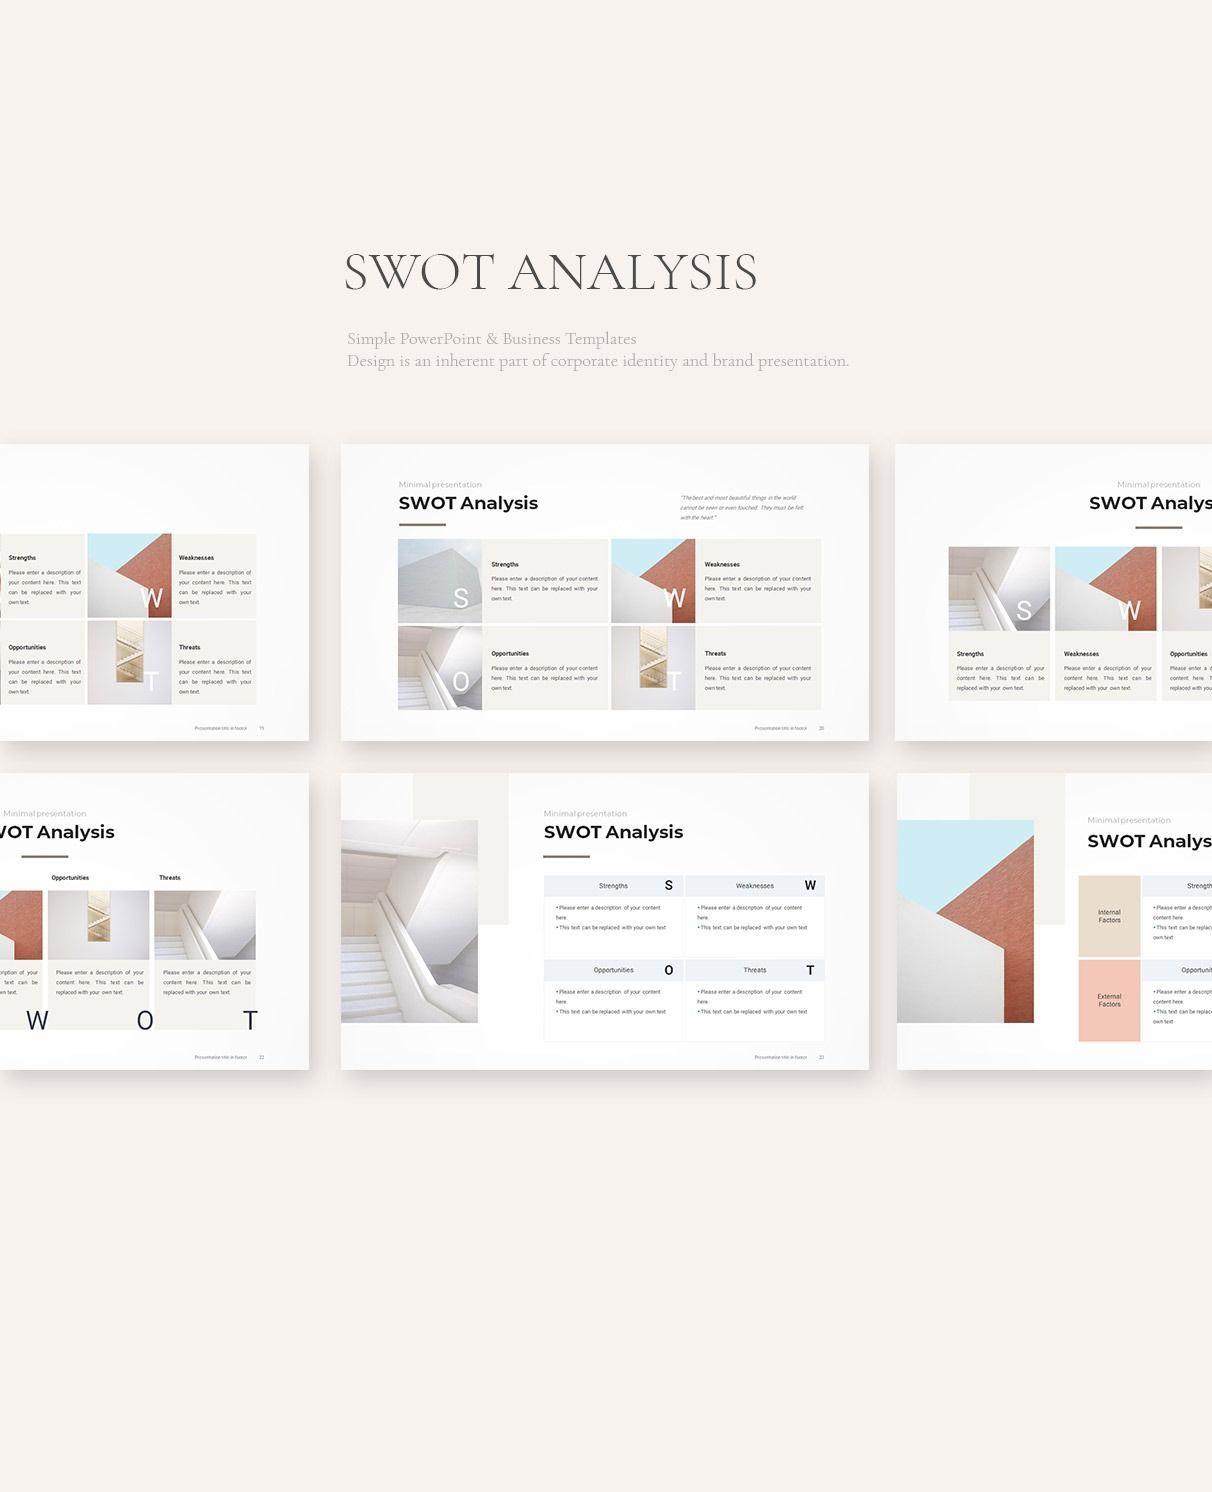 SWOT Analysis PowerPoint Template SWOT Analysis Ideas